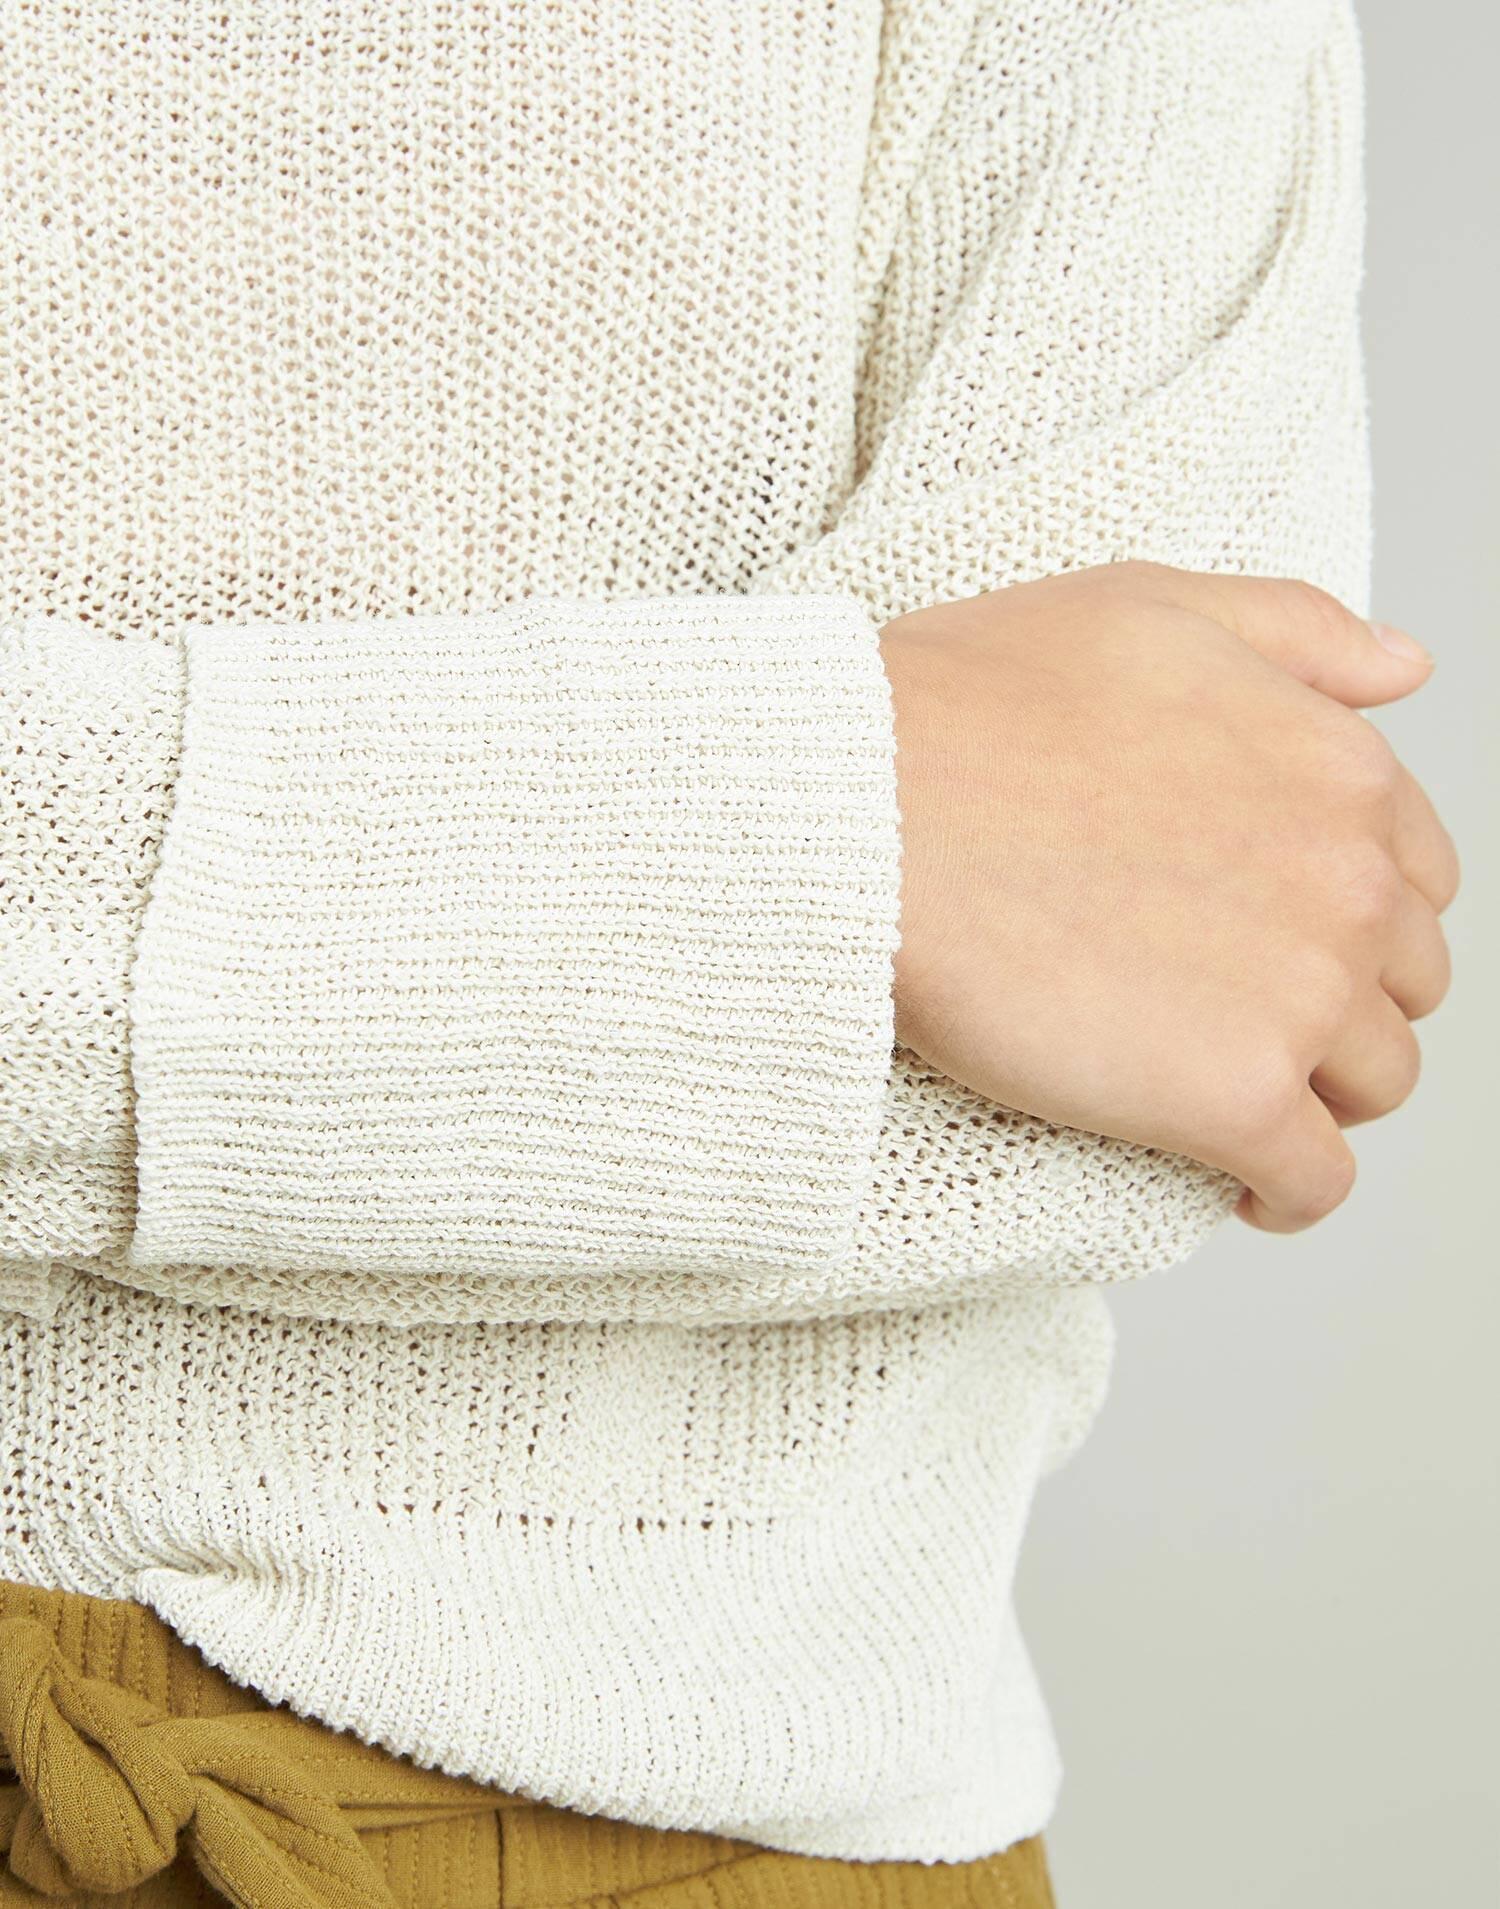 Openwork and turn-up cuffs sweater